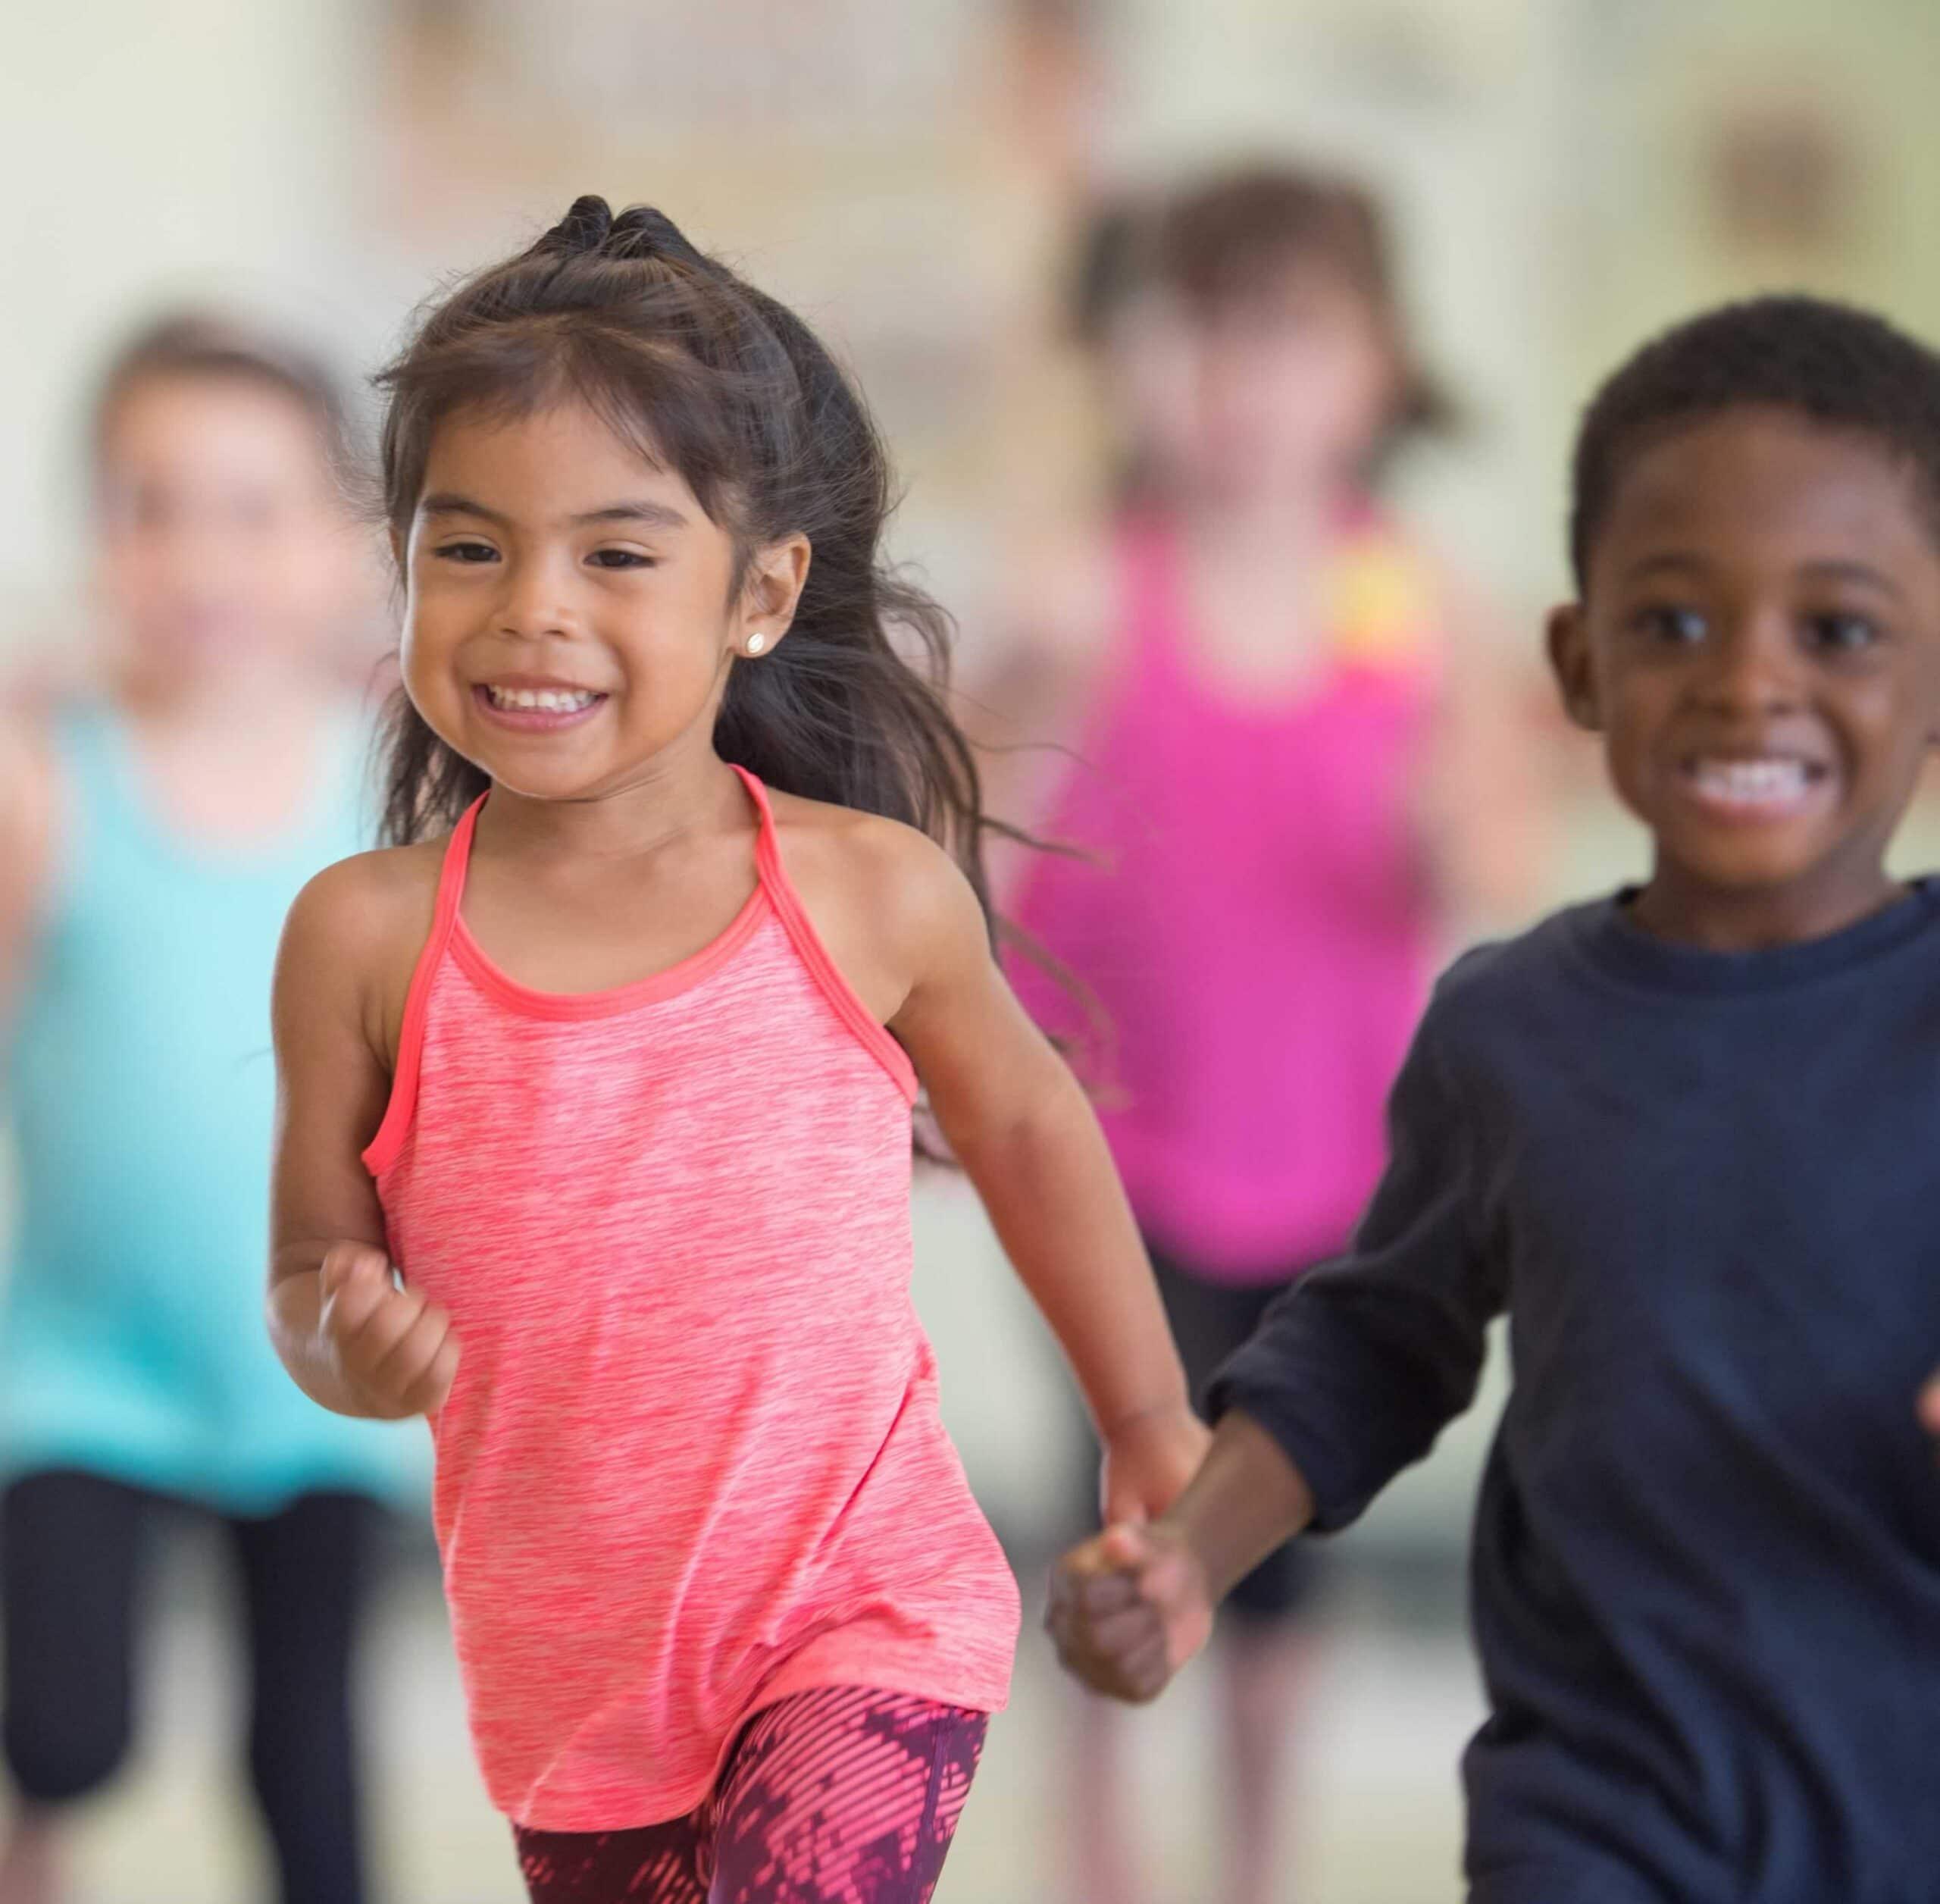 Children running and smiling.